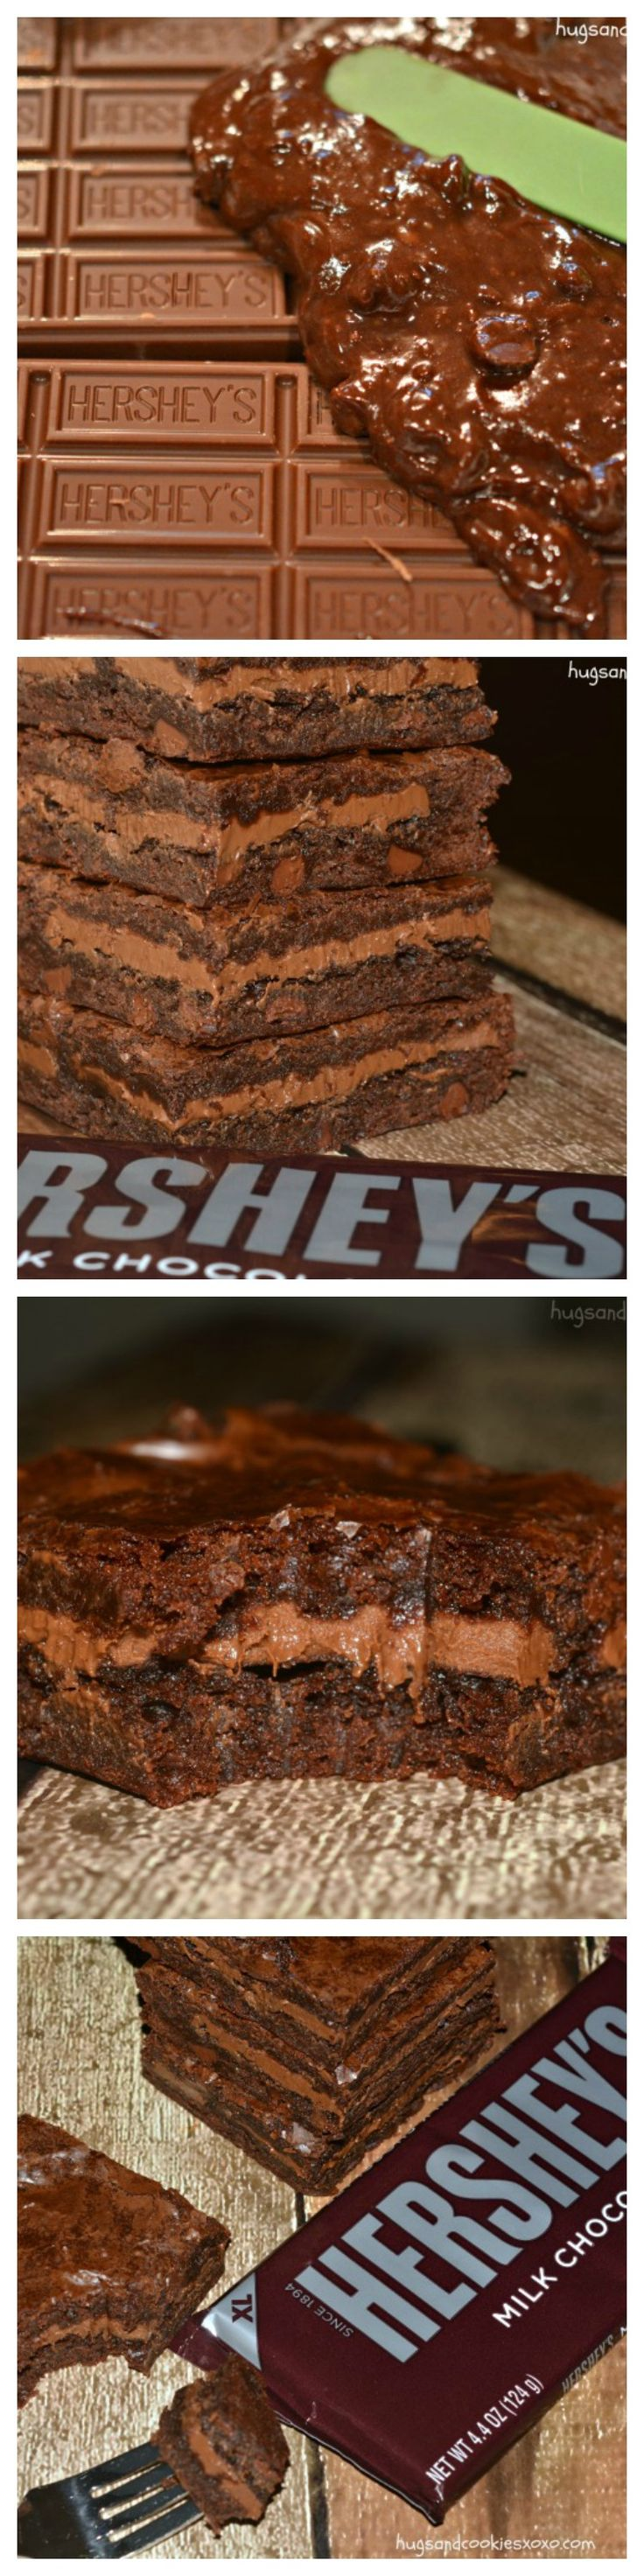 hershey stuffed brownie